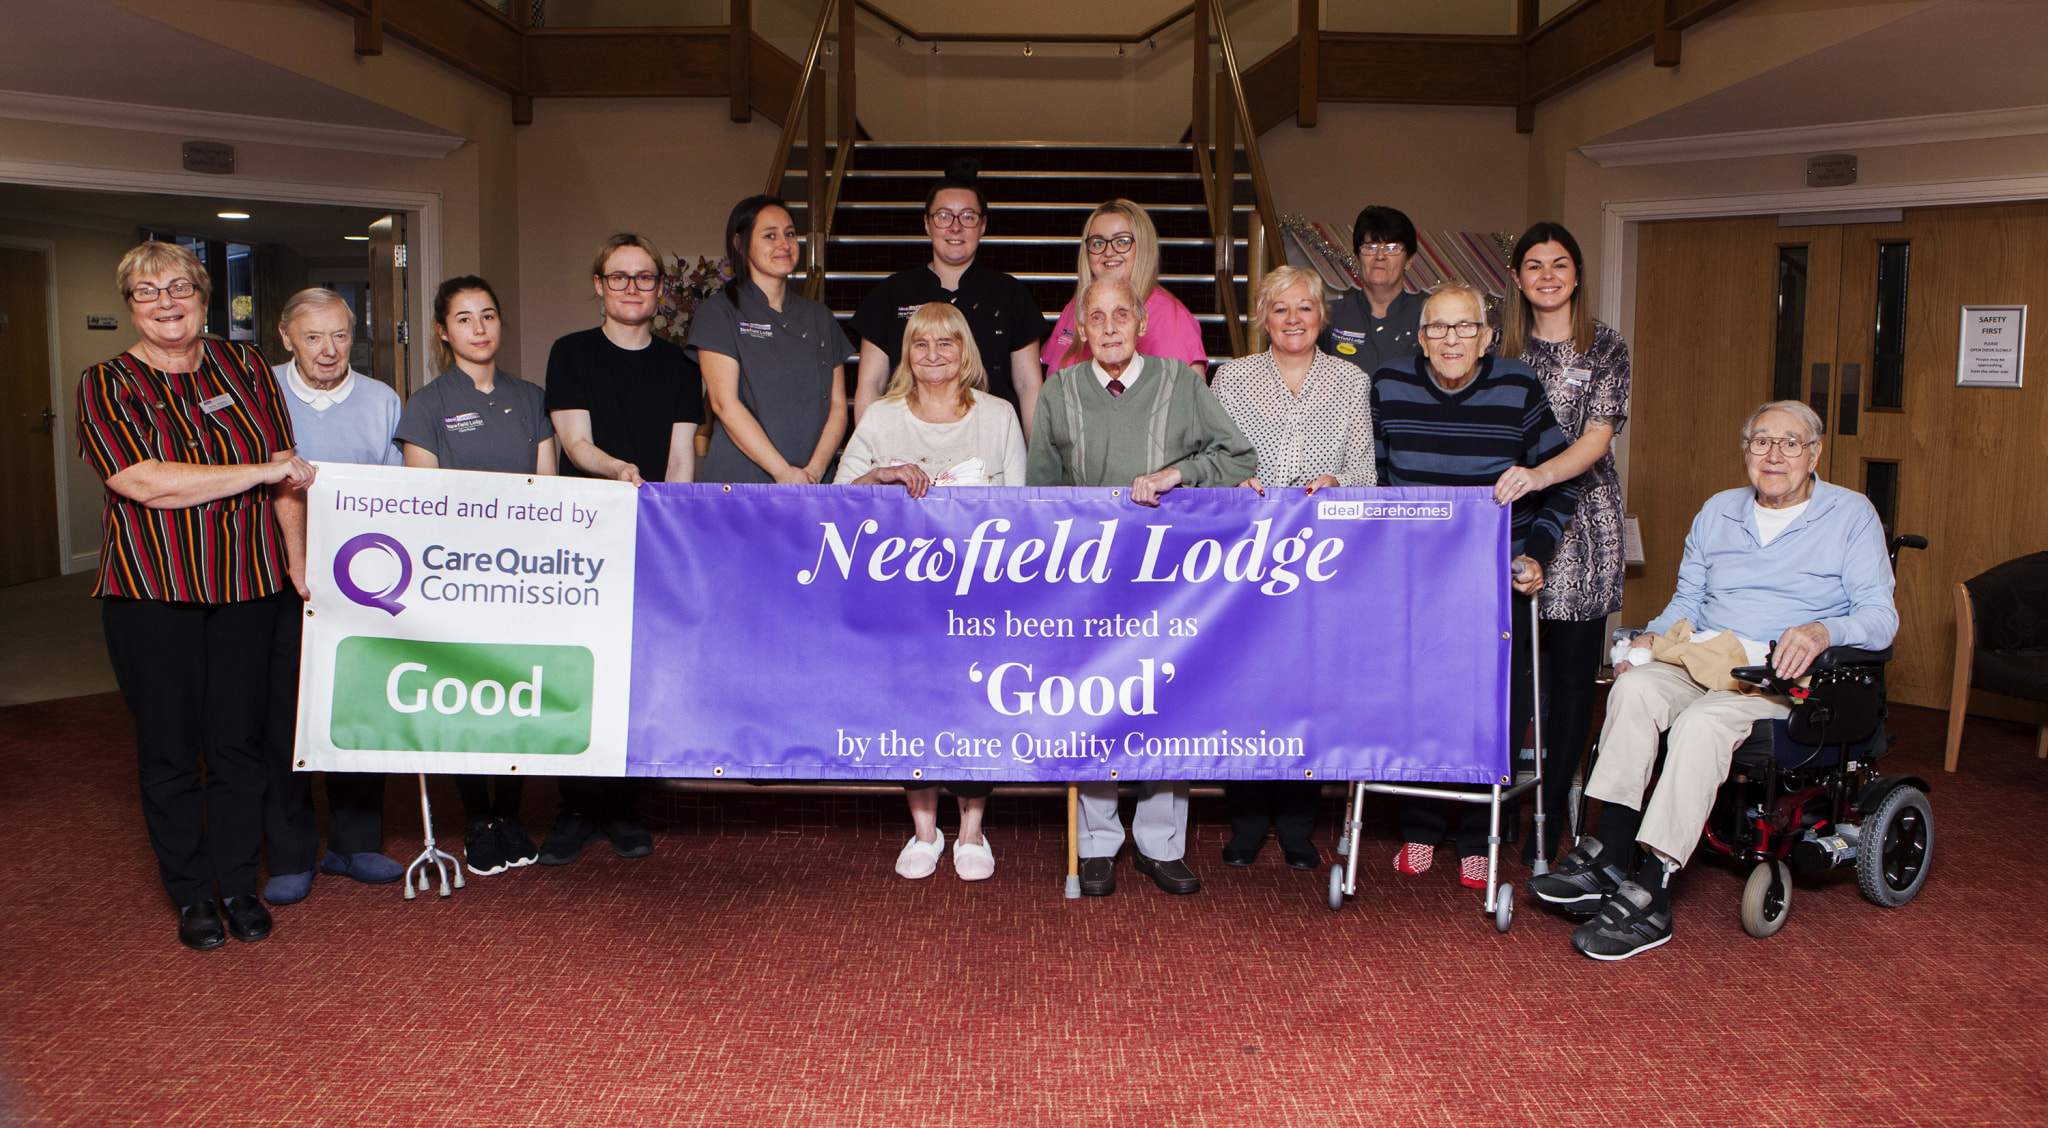 newfield lodge 003 a